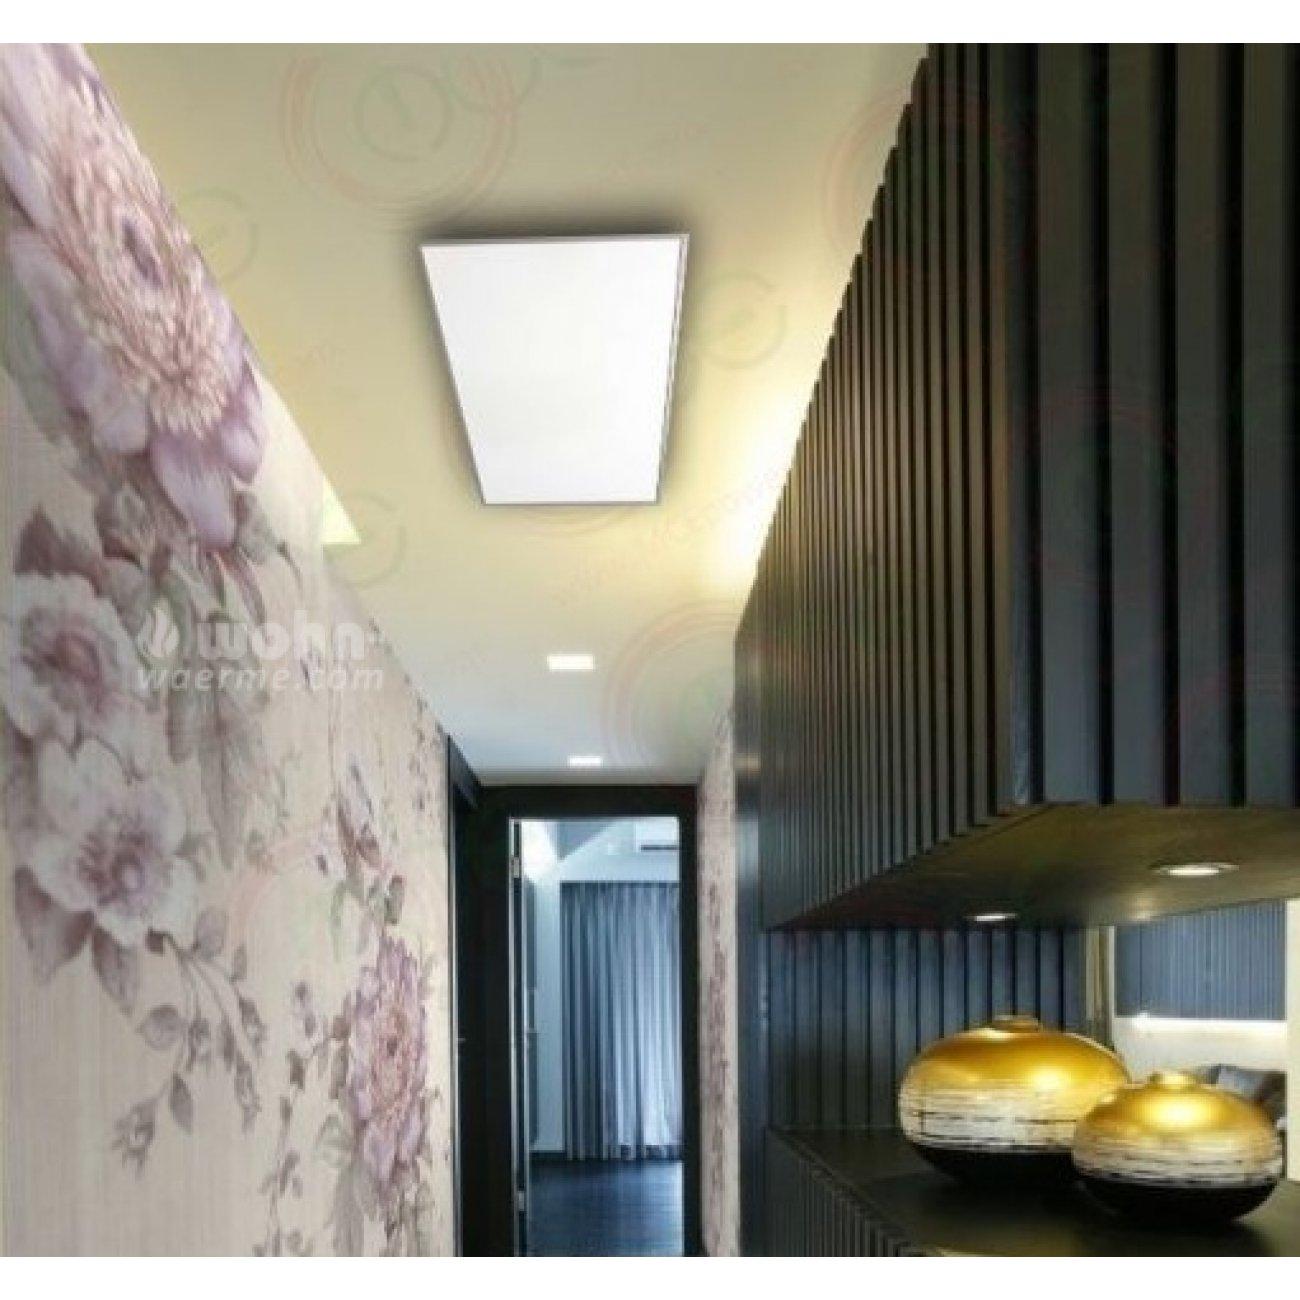 infrarot heizpaneele f r die decke. Black Bedroom Furniture Sets. Home Design Ideas